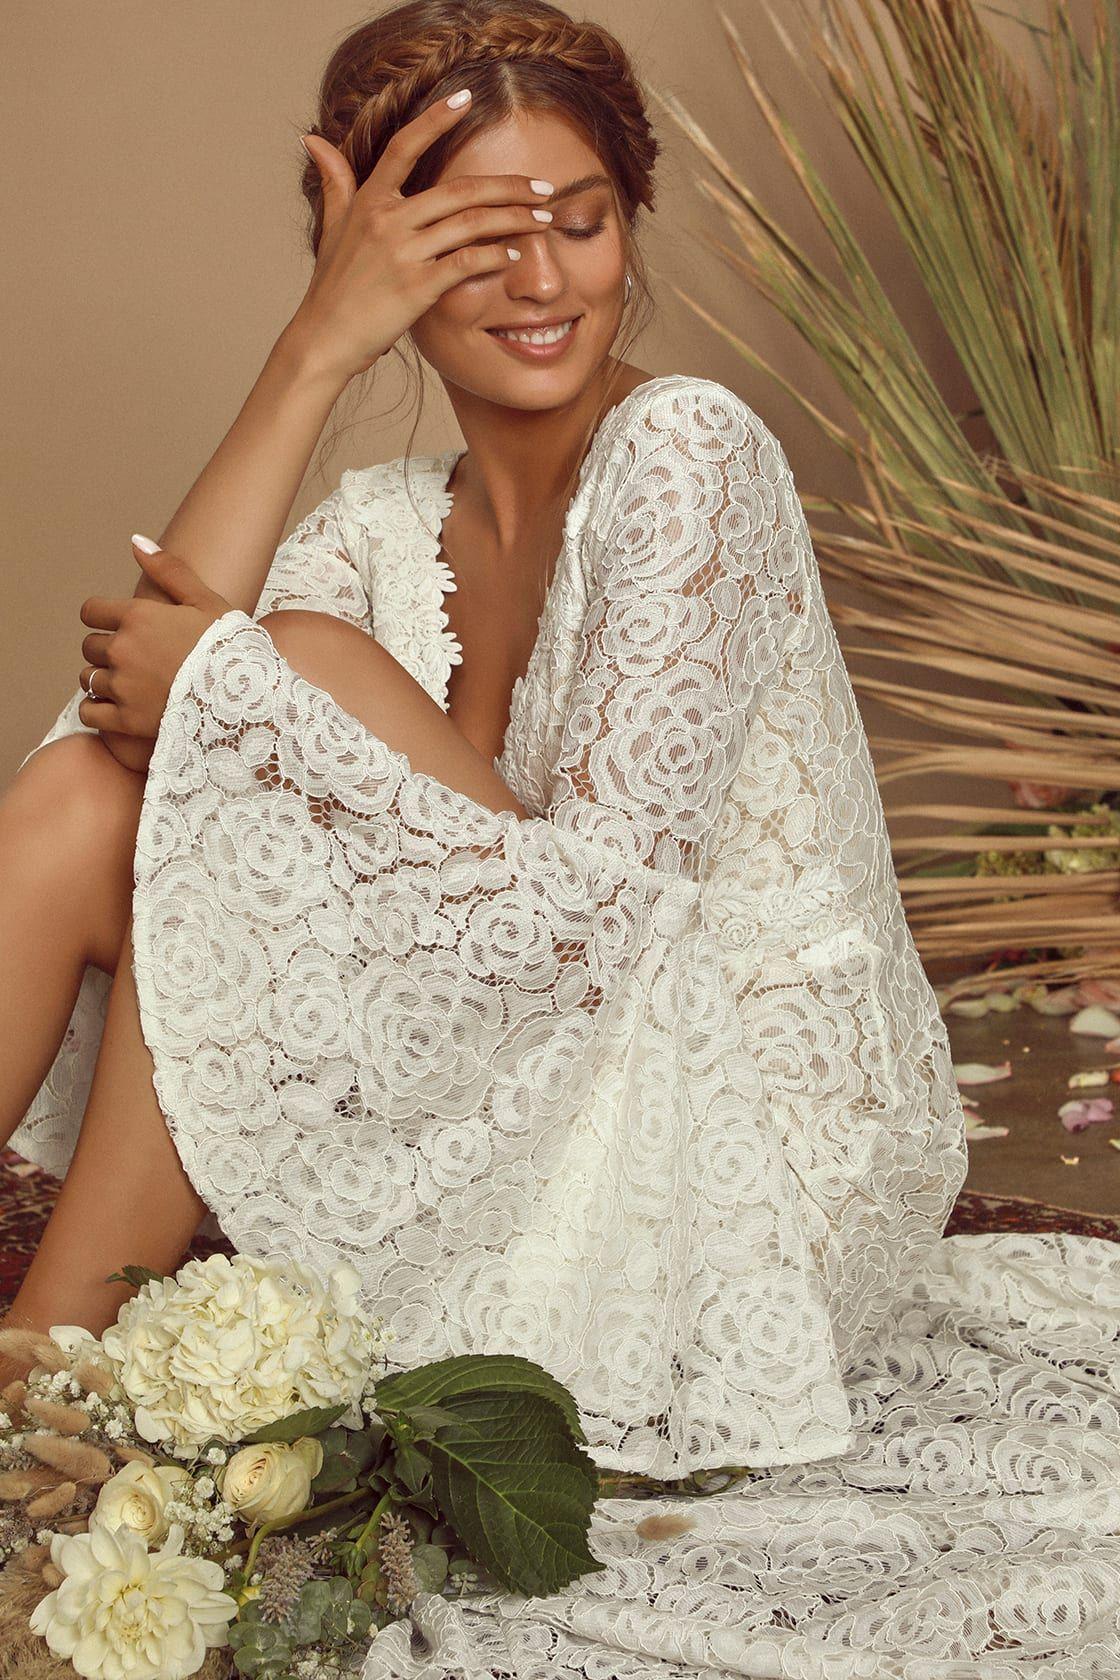 Duchess Ivory Lace Bell Sleeve Maxi Dress Maxi Dress With Sleeves Long Sleeve Lace Maxi Dress Long Sleeve Bridal Dresses [ 1680 x 1120 Pixel ]